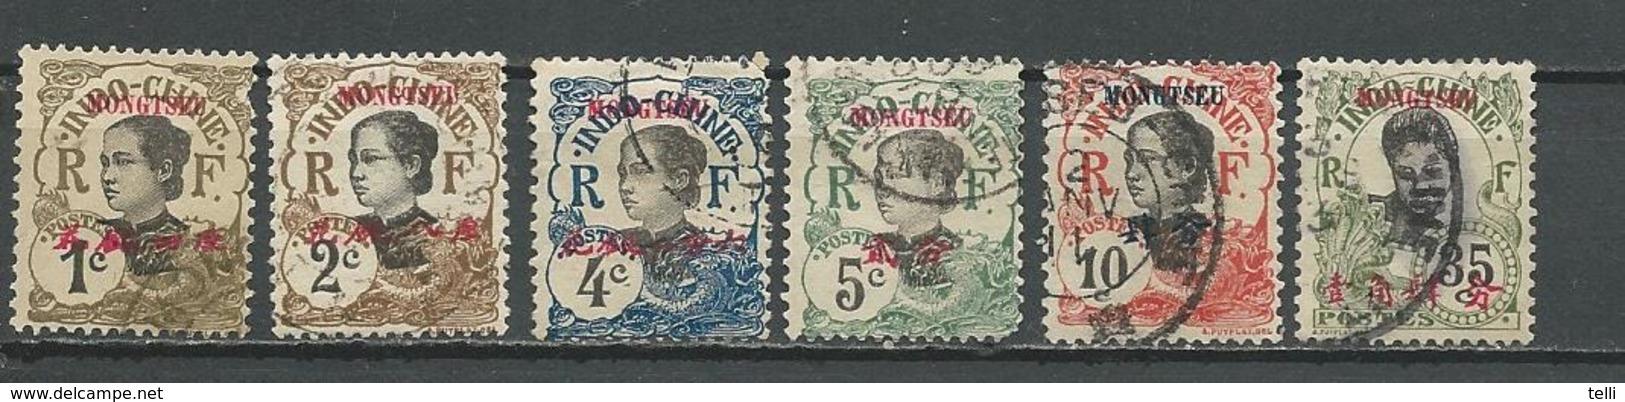 MONG TZEU Scott 33-37, 42 Yvert 34A-38, 43 (3) O 15,50 $ 1908 - Oblitérés